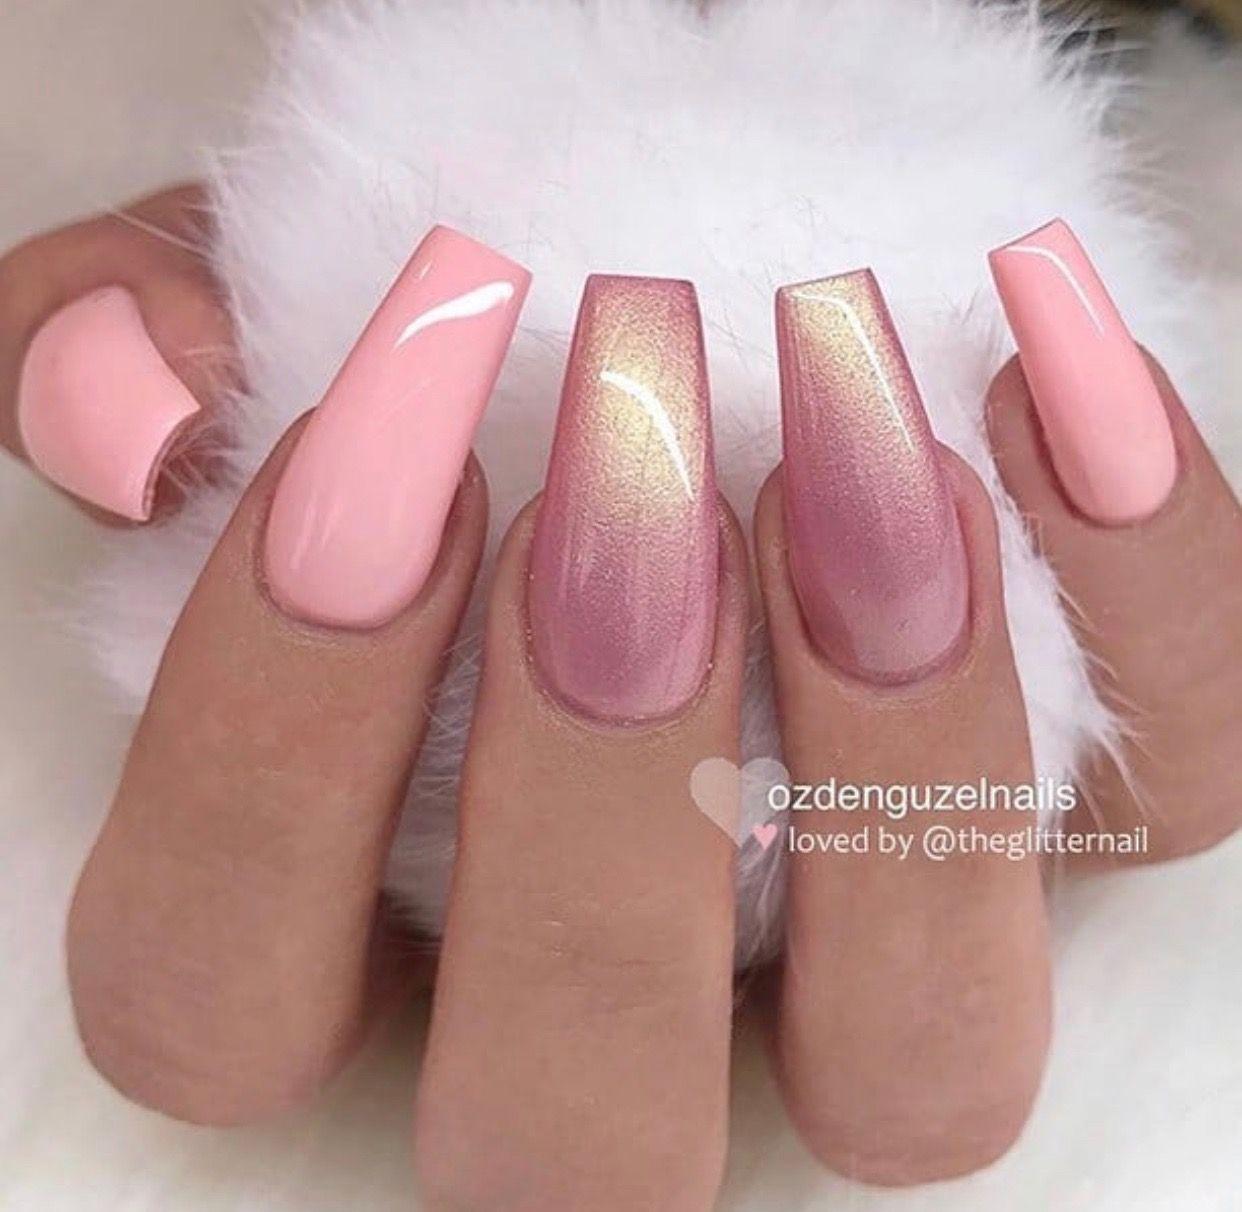 Stylish Gorgeous Glam Natural Nail Art Design Tutorial Polish Manicure Gel Painting Creative Coffin Nails Long Coffin Nails Designs Gorgeous Nails